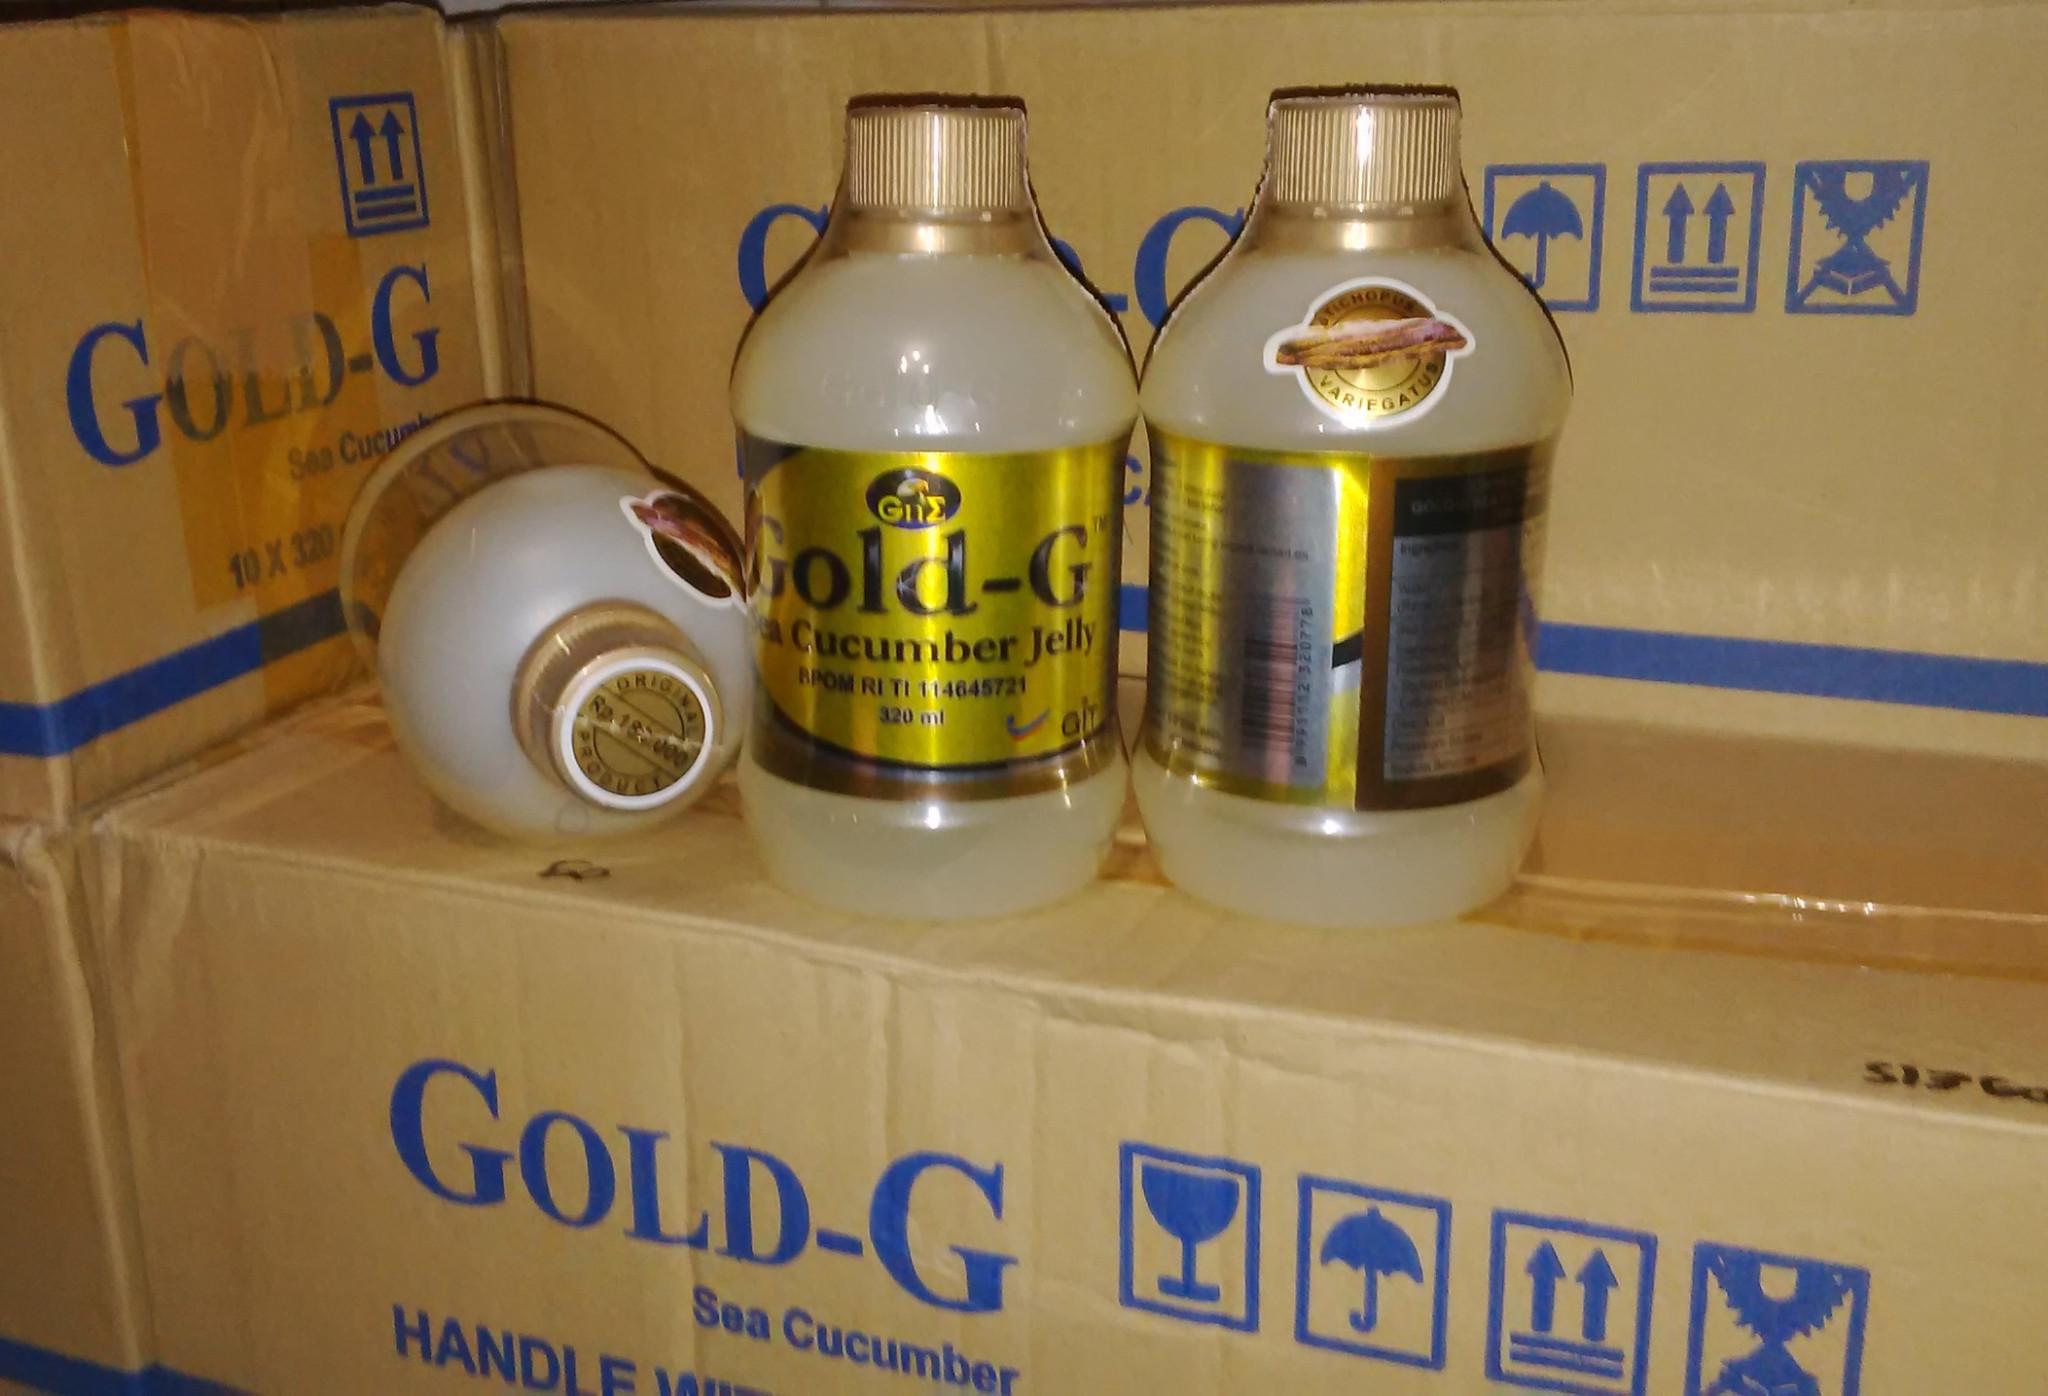 Jual Jelly Gamat Gold G Sea Cucumber Asli Original Obat Lambung 320 Ml Diabetes Al Hadid Herbal Tokopedia